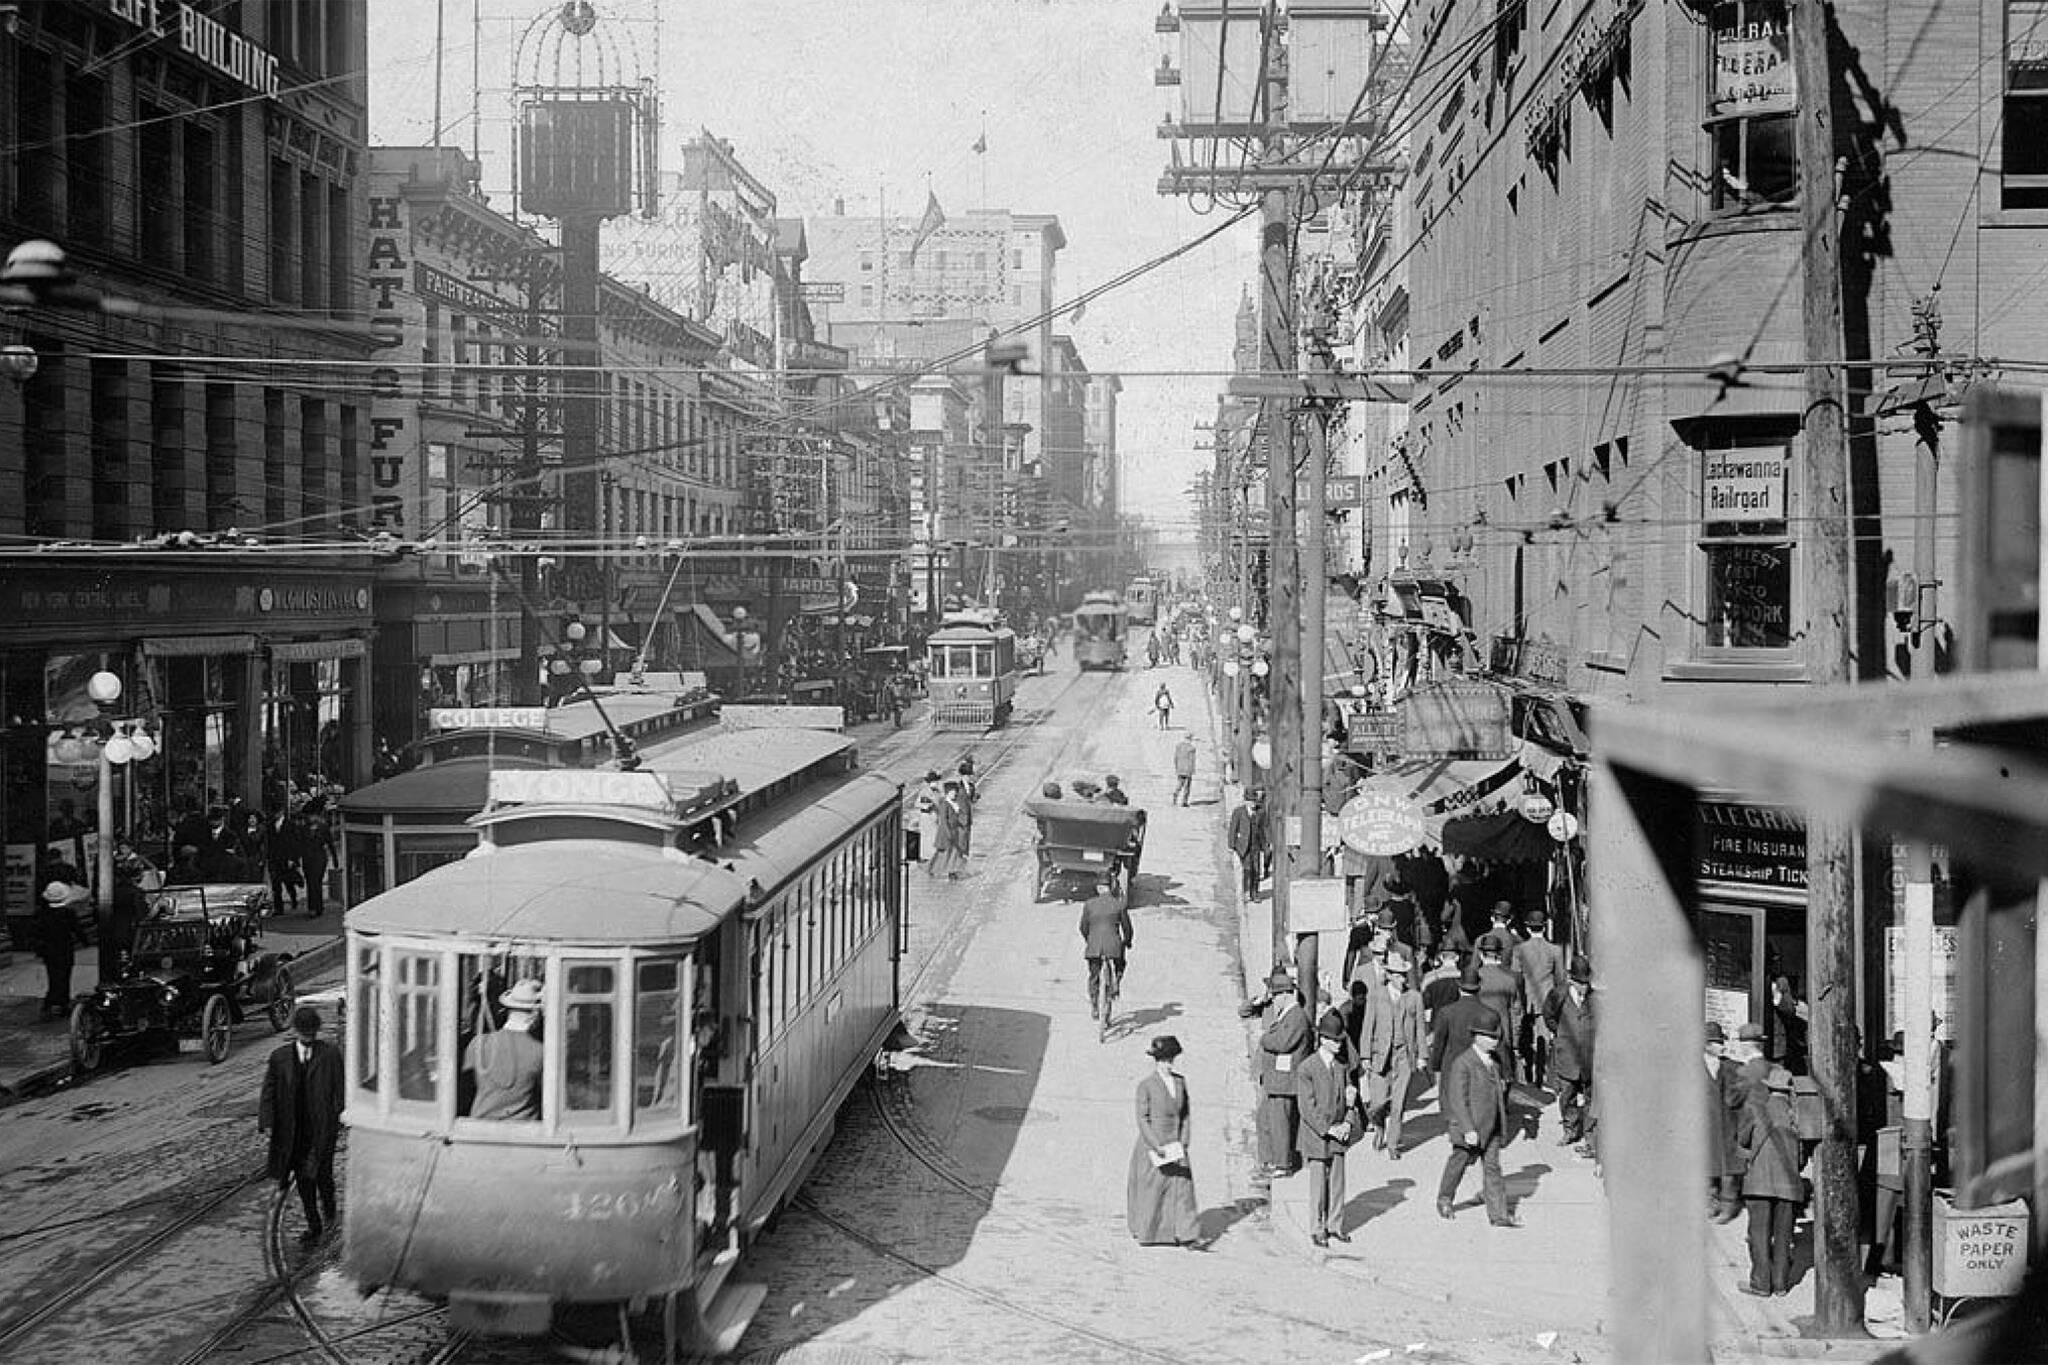 Toronto History photos